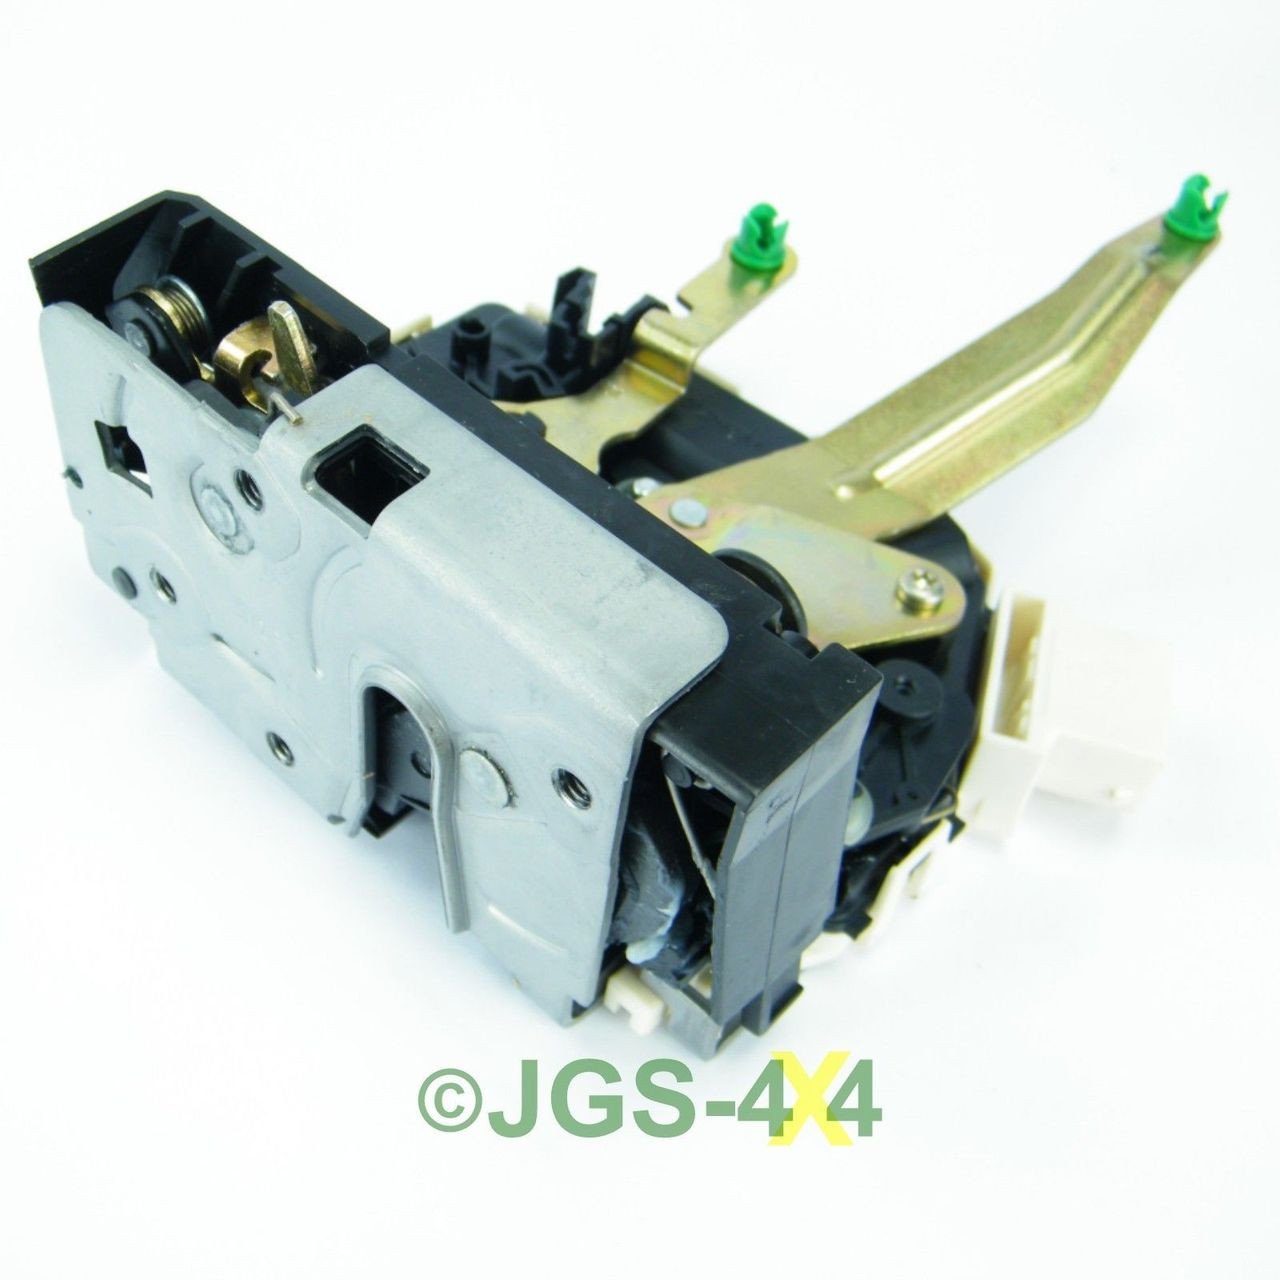 Land Rover Discovery 2 Central Locking Wiring Diagram Schematic Defender Rear Door Latch Motor Fqr100570 Jgs Range